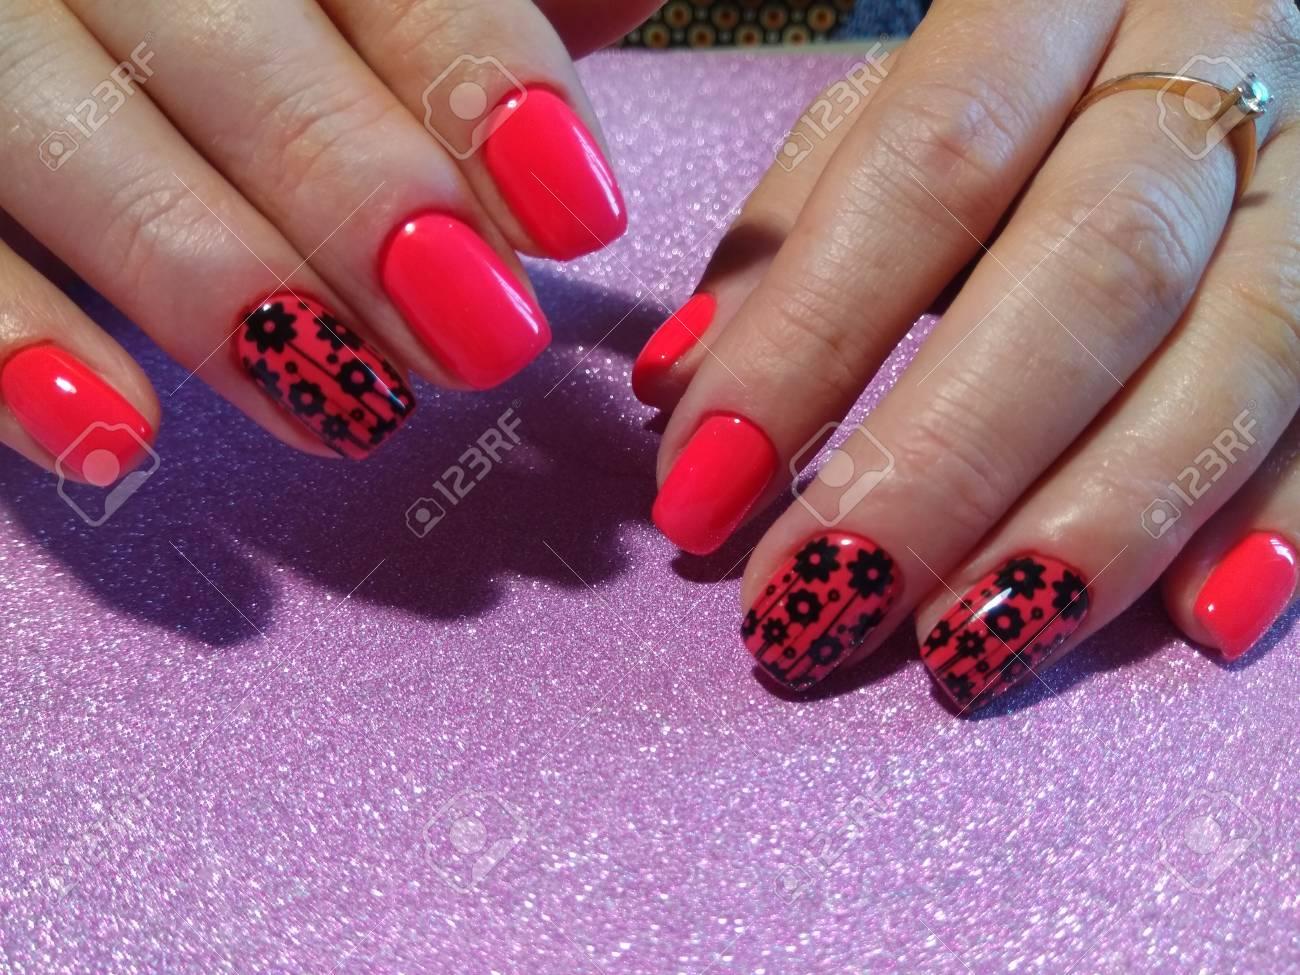 Nail Art Design Nagellak Beauty Handen Trendy Stijlvolle